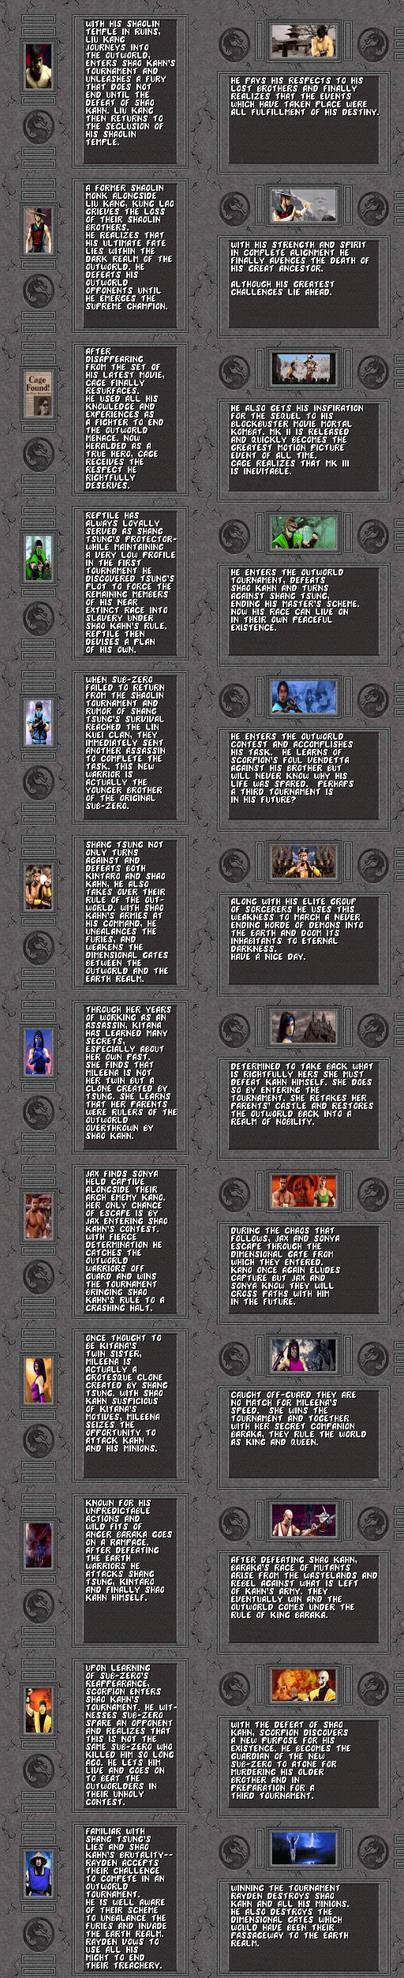 Mortal Kombat II Endings